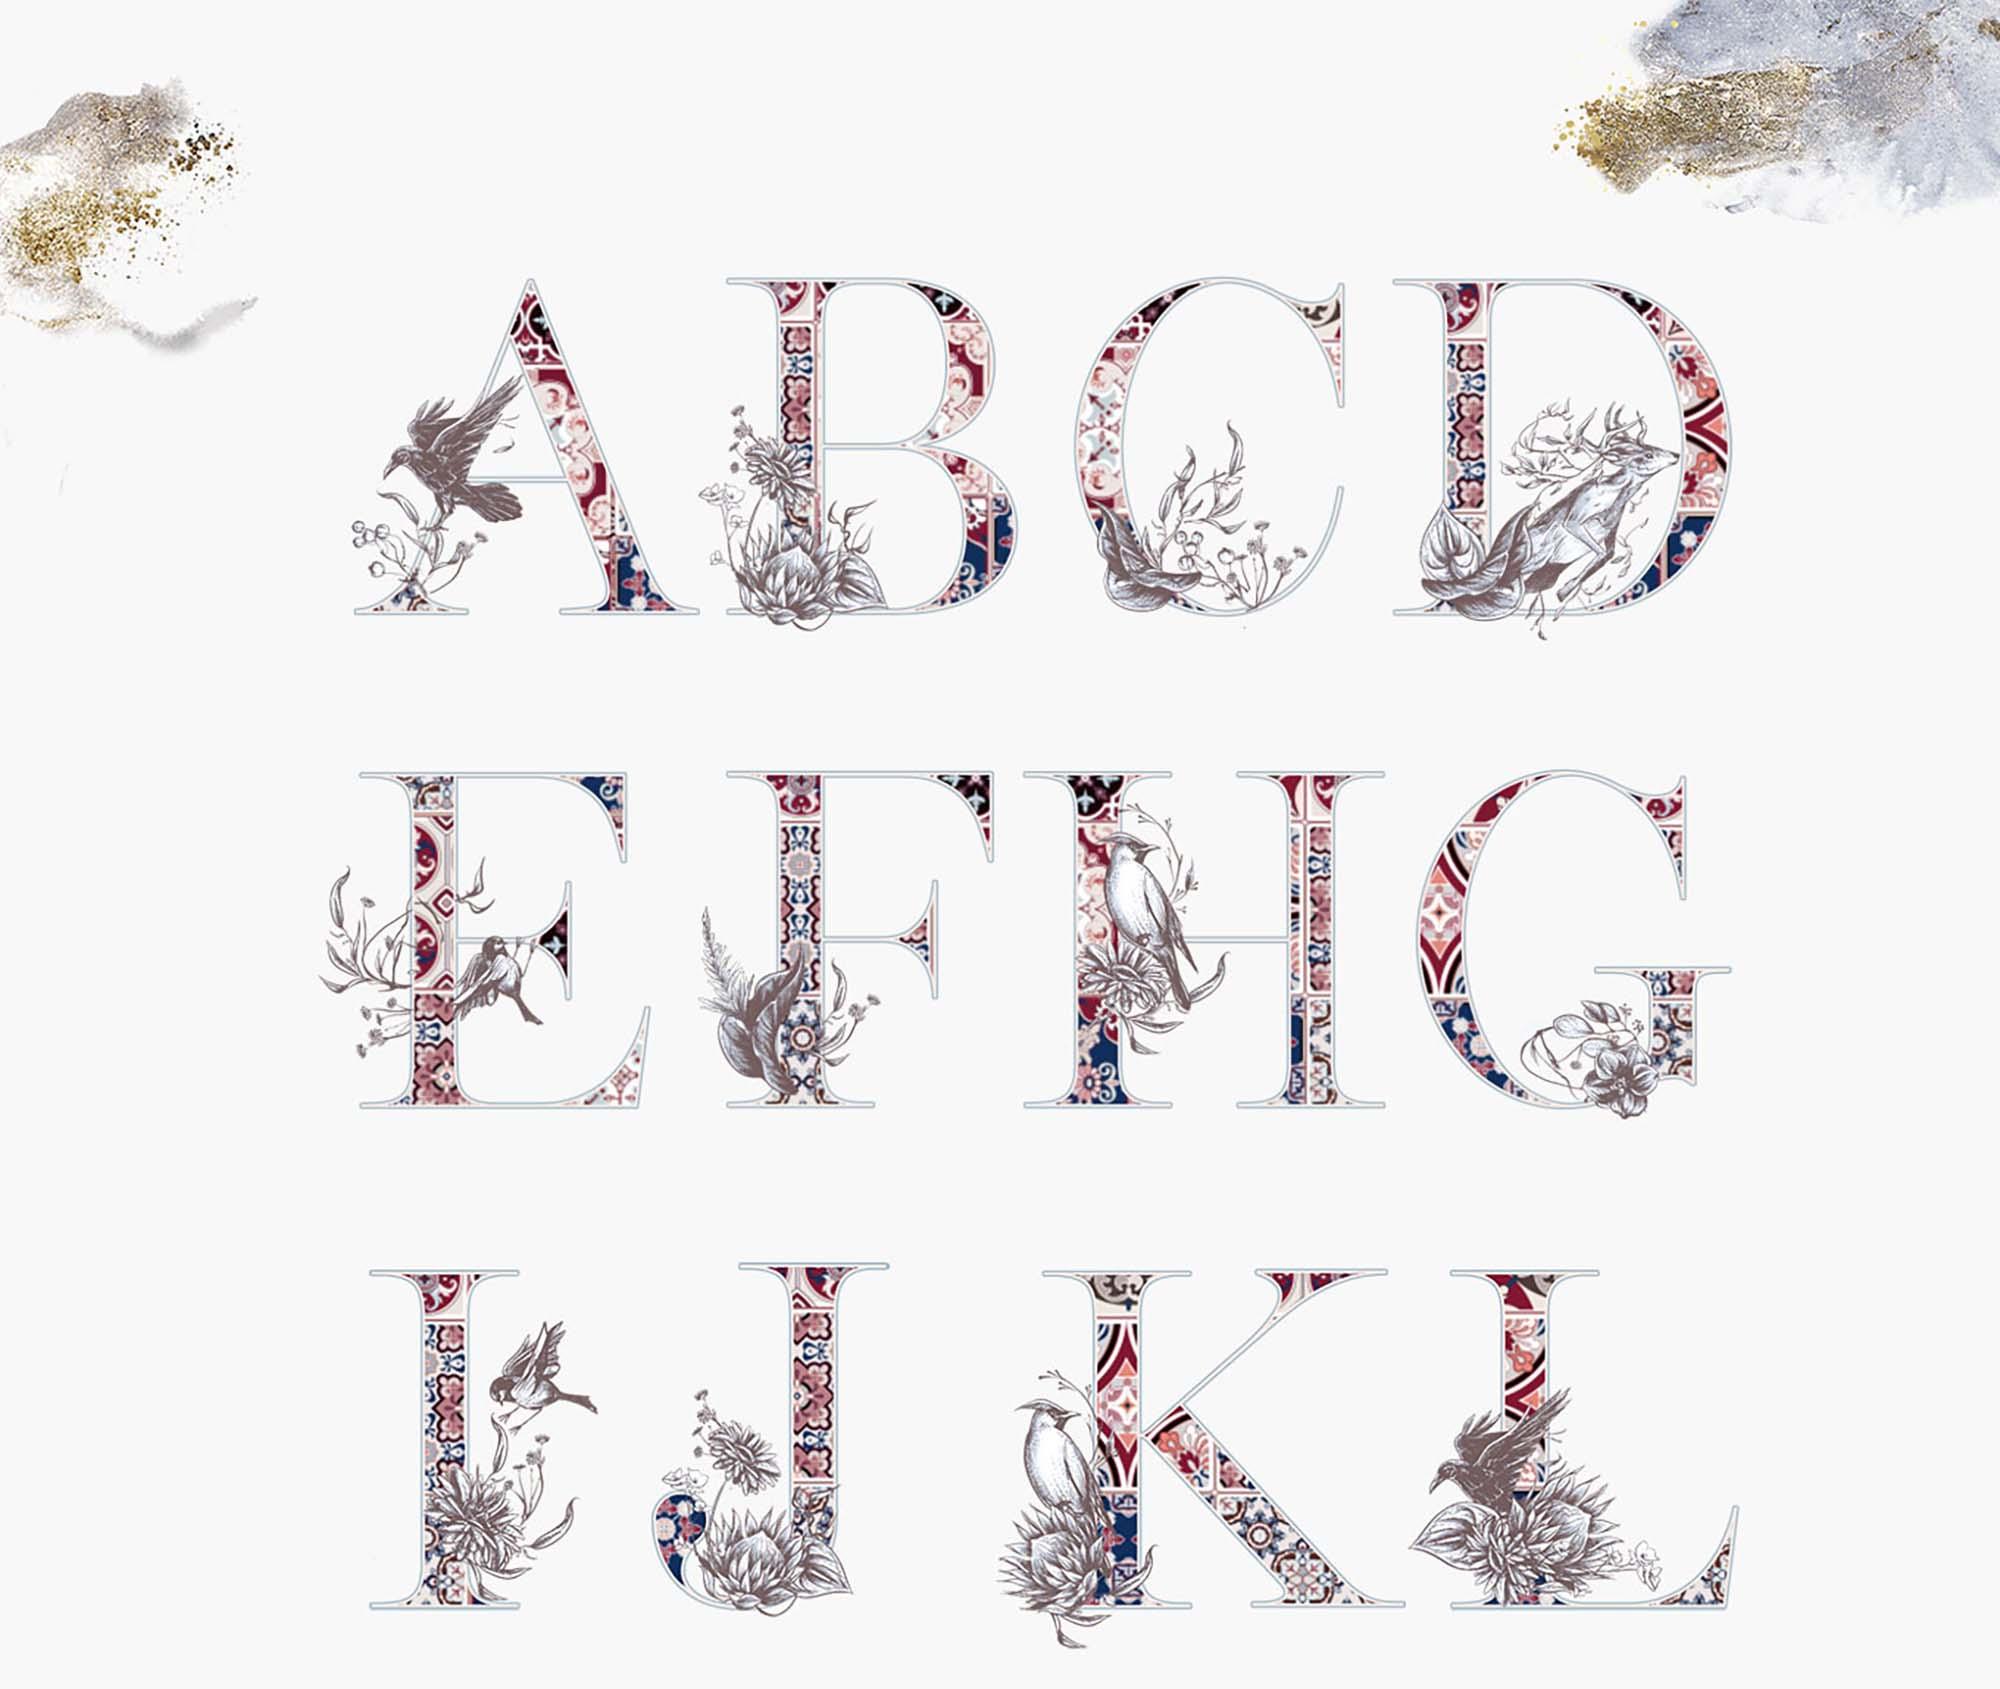 Noel Whisper Watercolor Alphabets 2-1